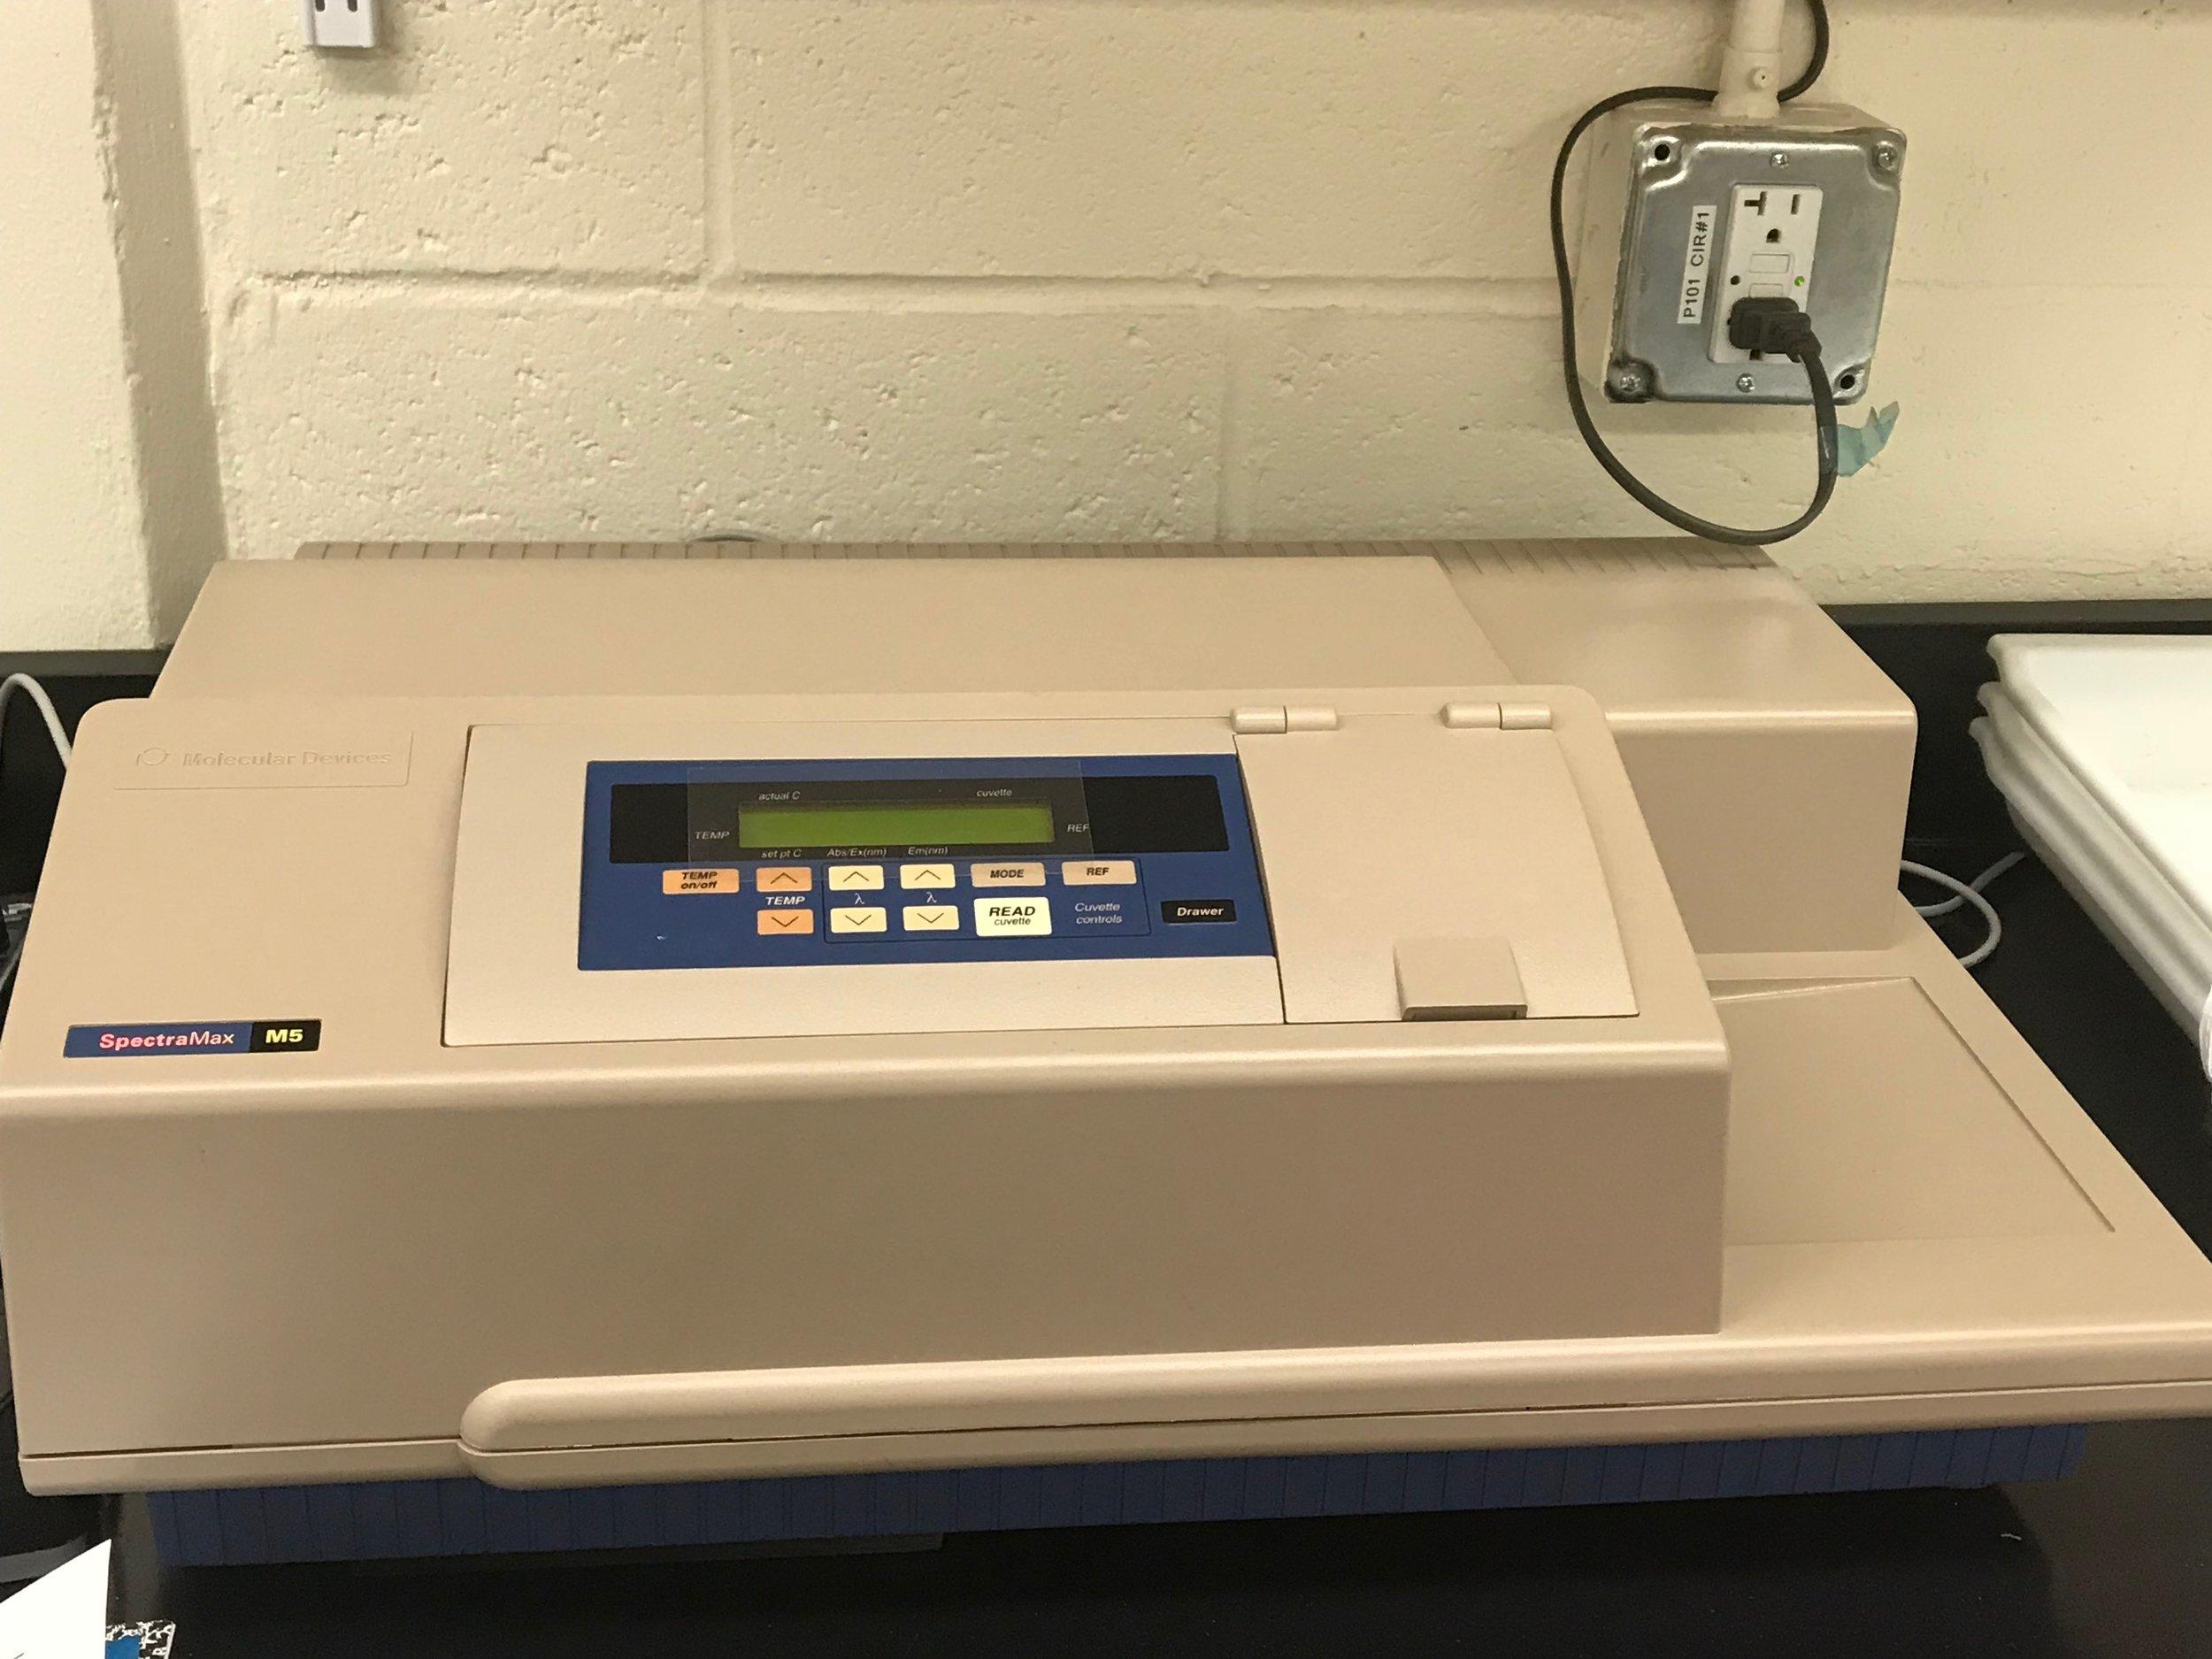 Molecular Devices Spectramax M5 Multimode Plate Reader -